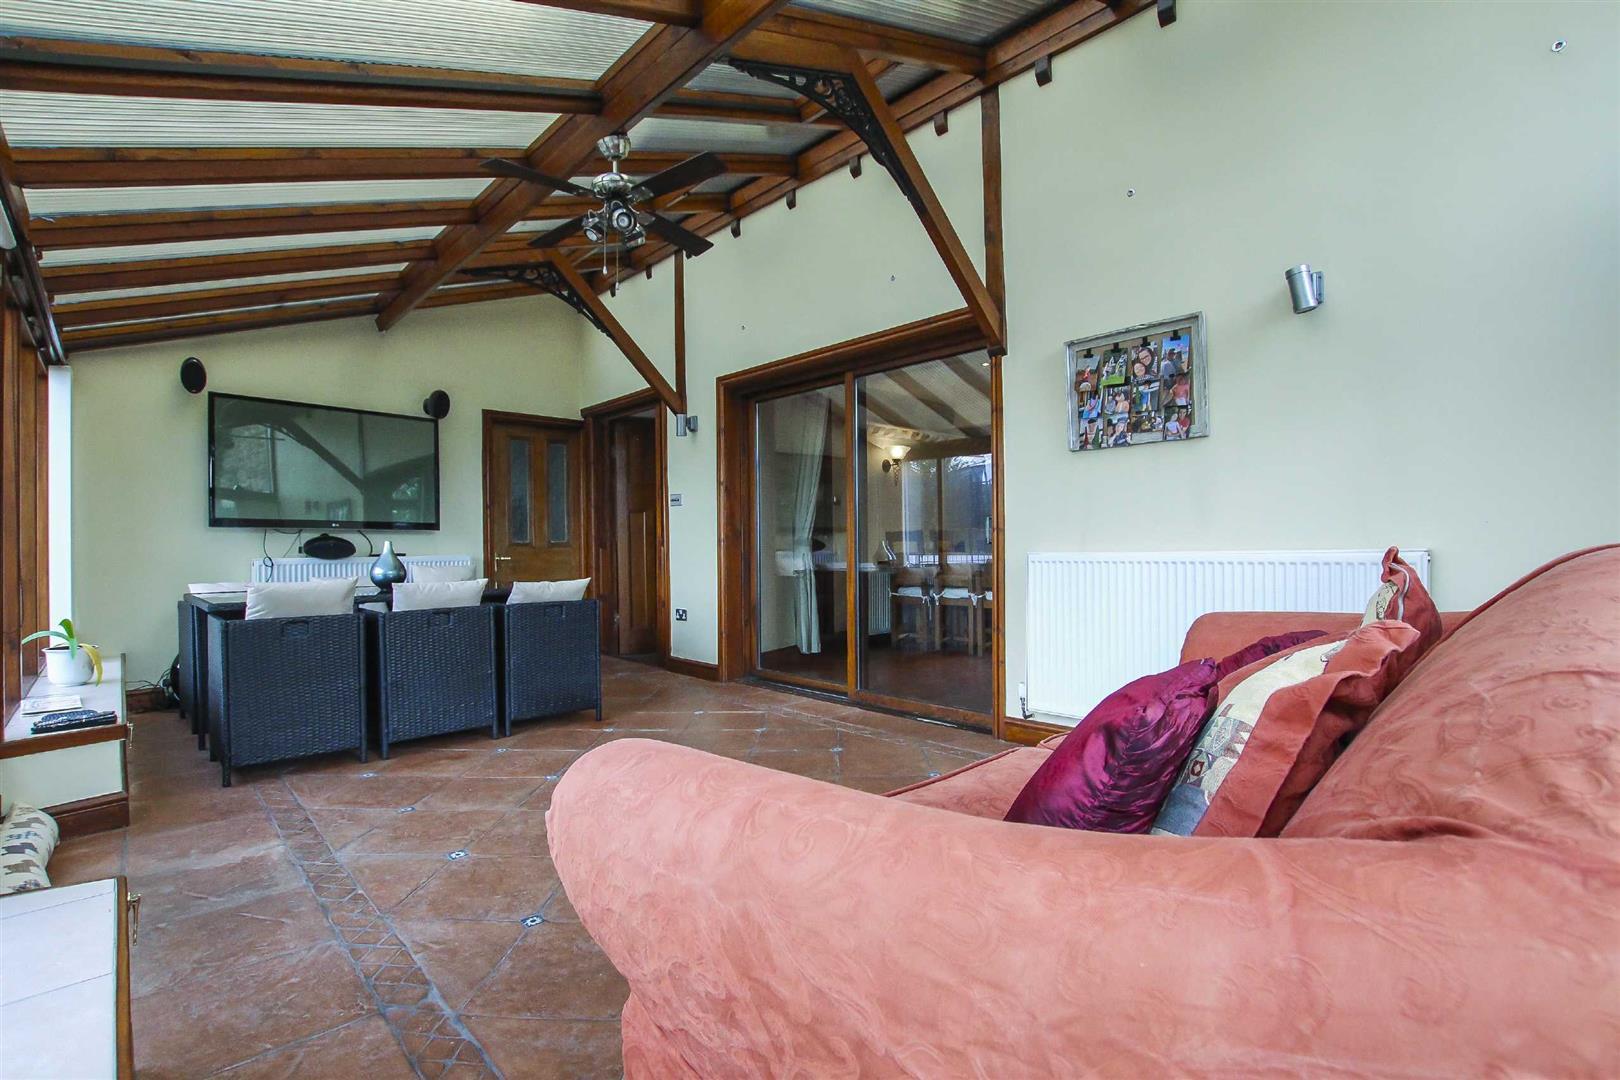 5 Bedroom Barn Conversion For Sale - p026519_12.jpg